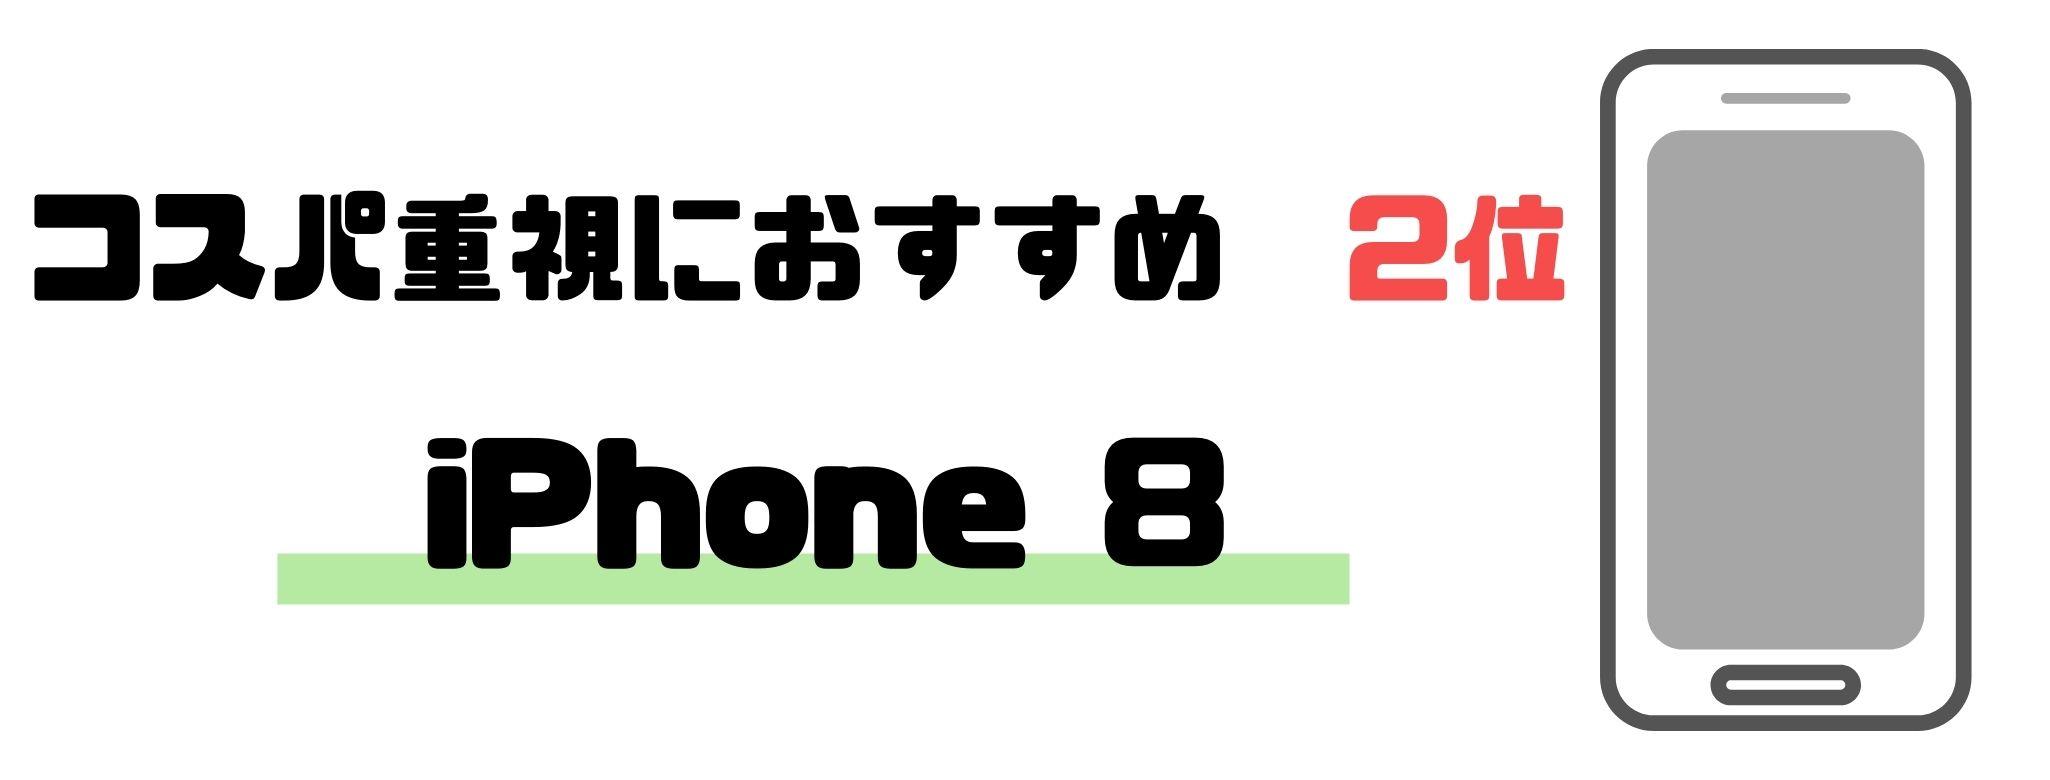 iPhone_おすすめ_コスパ2